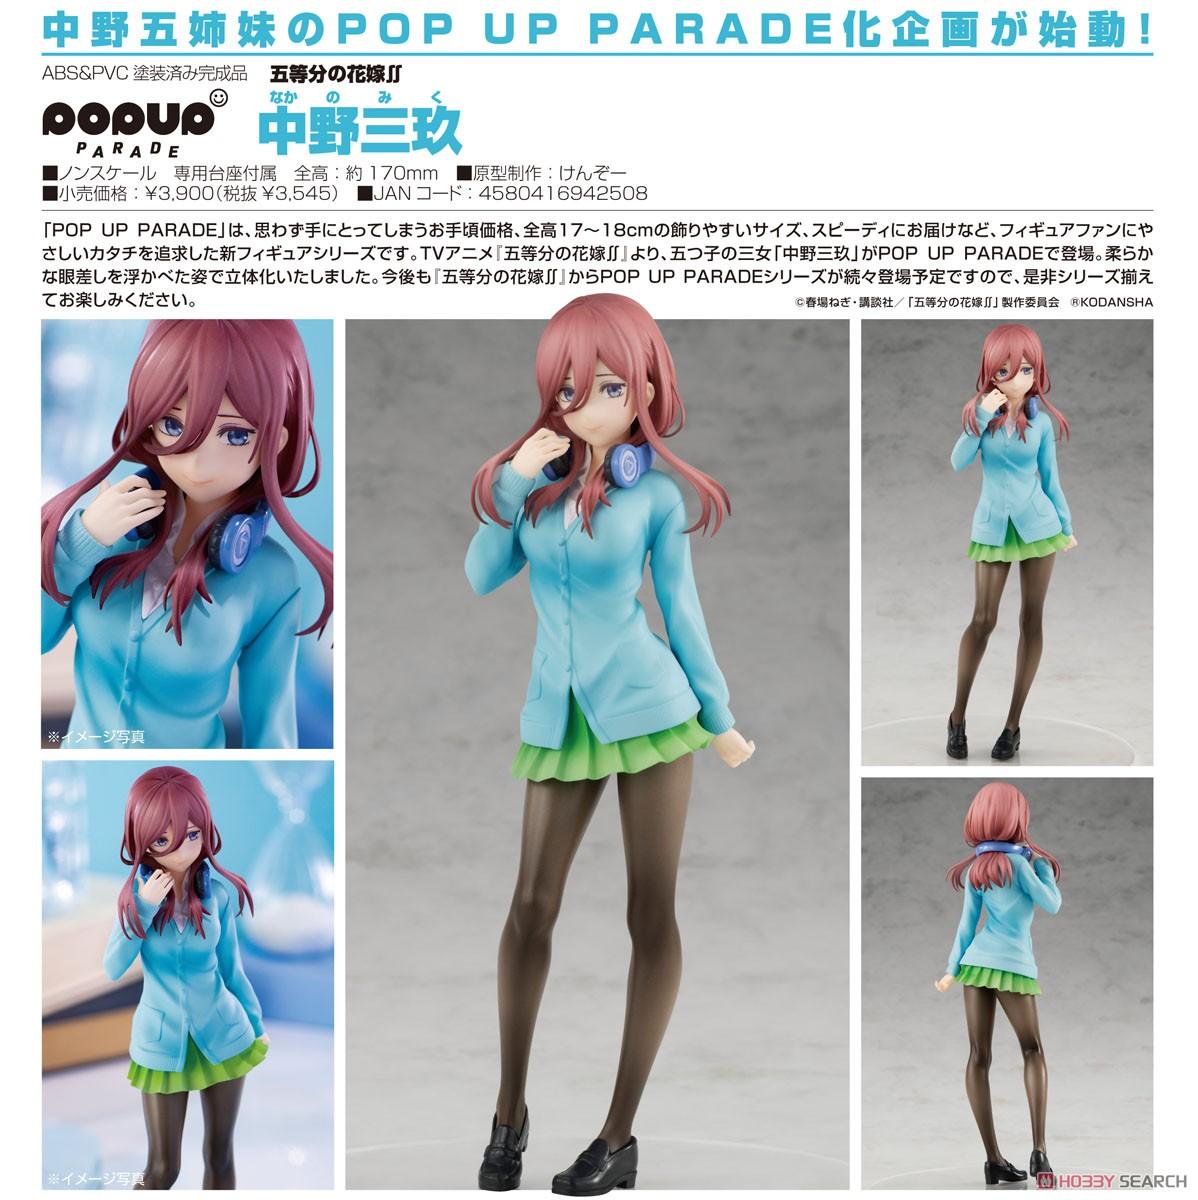 POP UP PARADE『中野三玖』五等分の花嫁∬ 完成品フィギュア-010